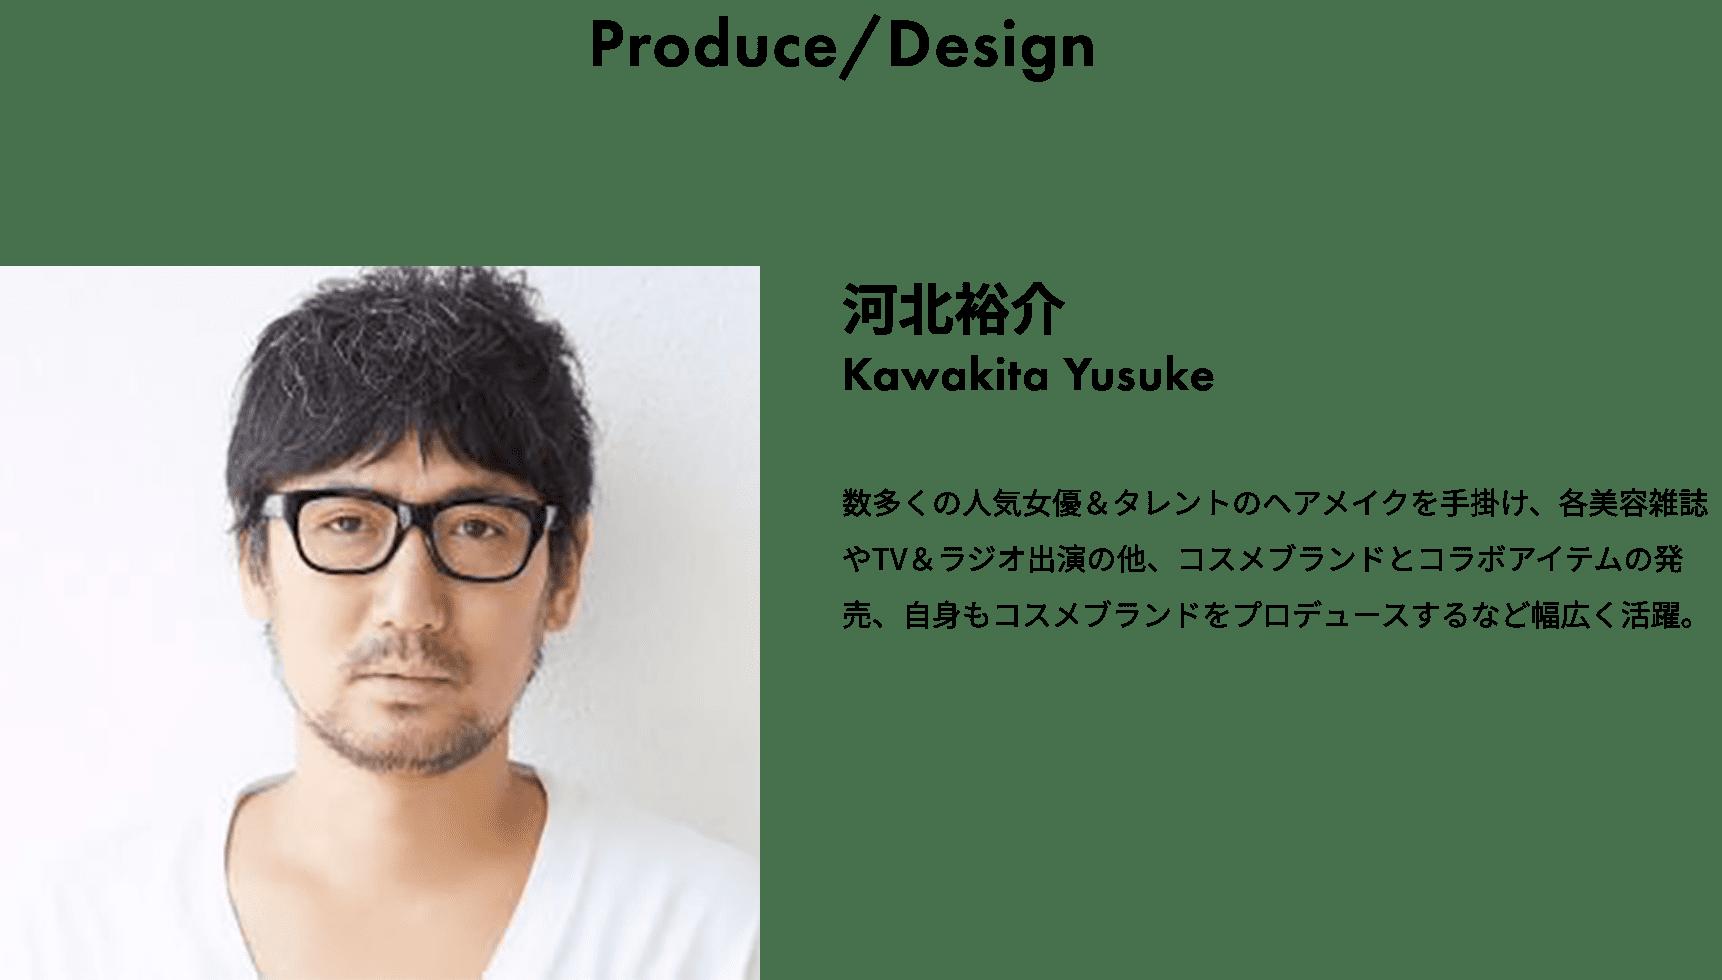 Produce/Design 河北裕介 Kawakita Yusuke 数多くの人気女優&タレントのヘアメイクを手掛け、各美容雑誌やTV&ラジオ出演の他、コスメブランドとコラボアイテムの発売、自身もコスメブランドをプロデュースするなど幅広く活躍。